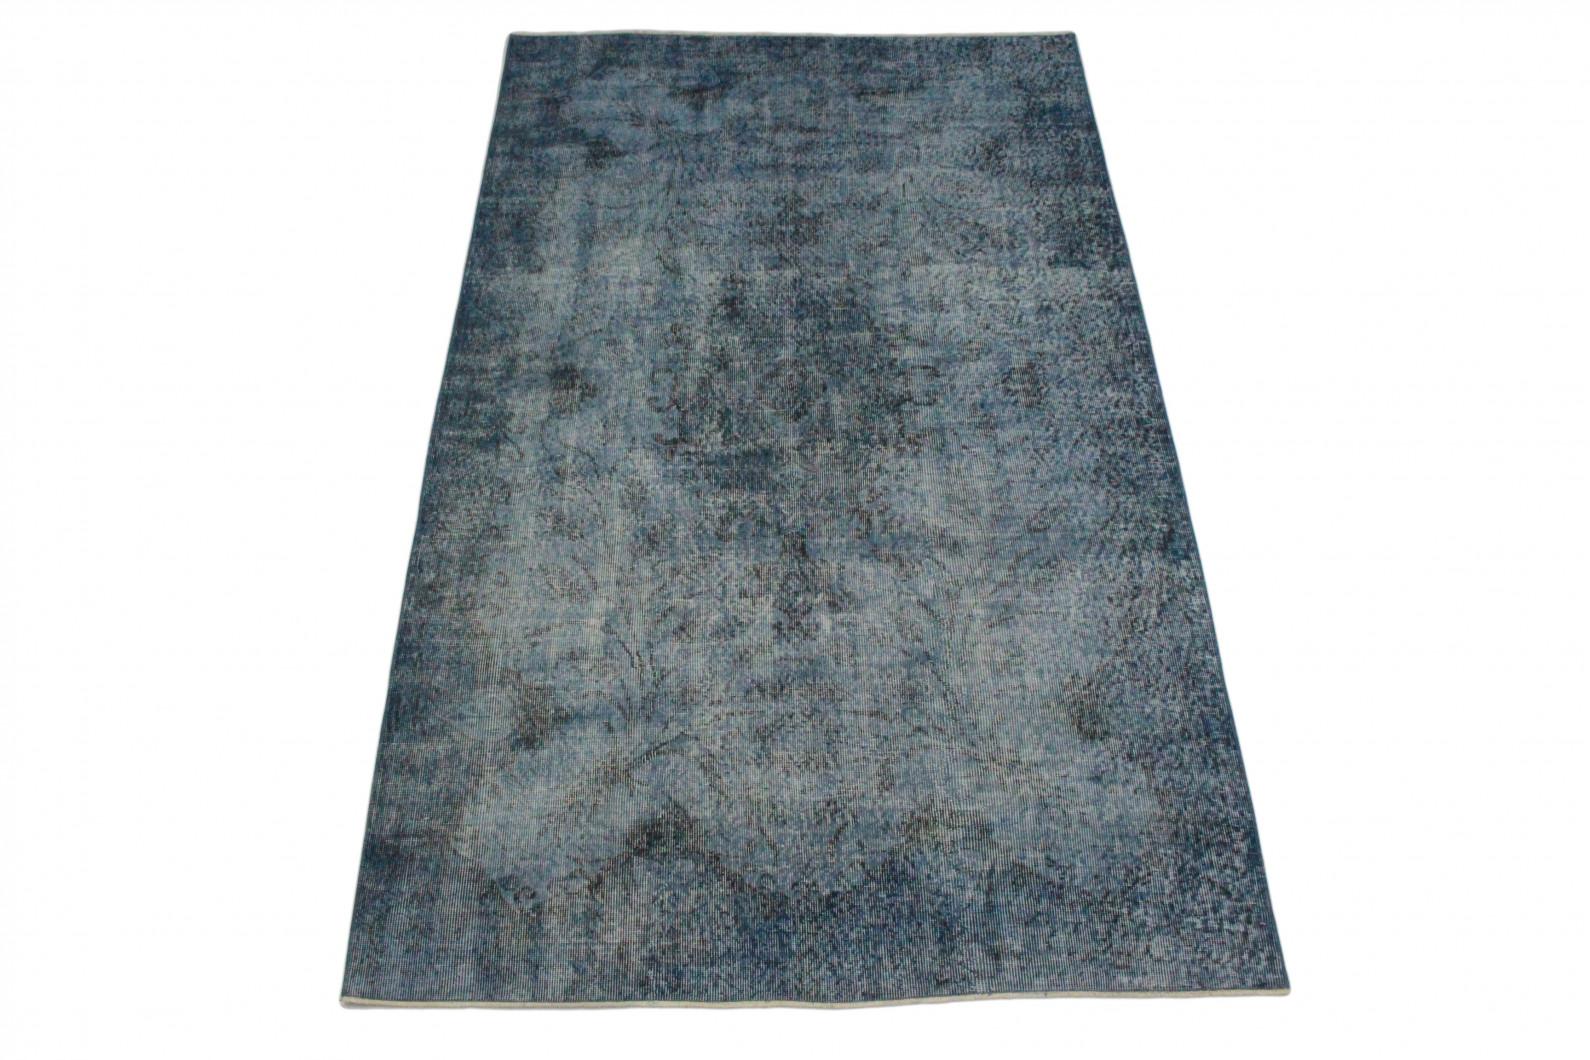 vintage teppich blau grau in 270x160 1011 5163 bei. Black Bedroom Furniture Sets. Home Design Ideas